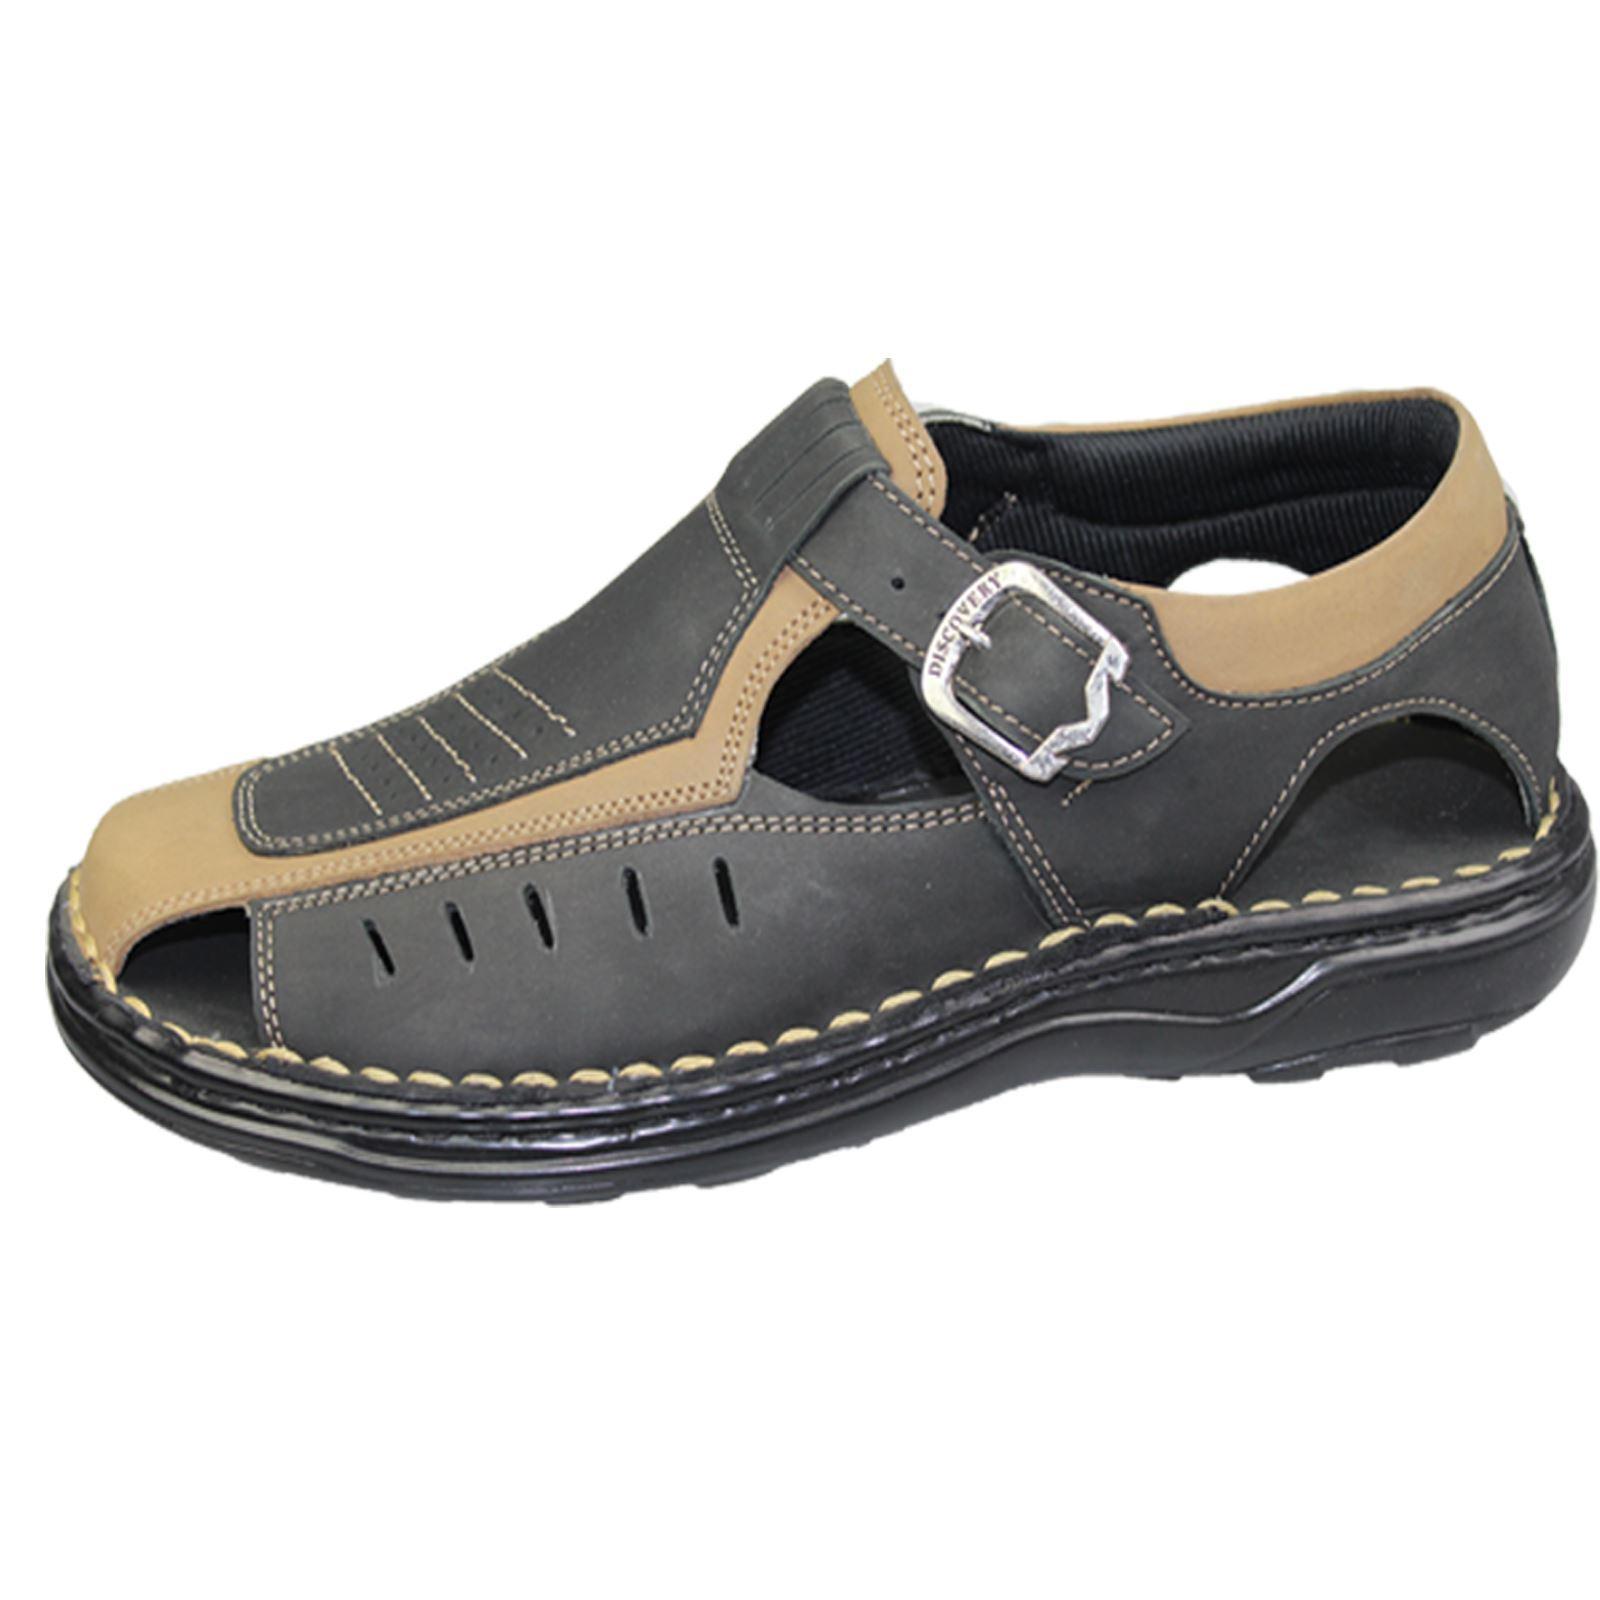 Mens-Buckle-Fastening-Sandals-Flat-Beach-Walking-Fashion-Casual-Summer-Slipper miniatura 5